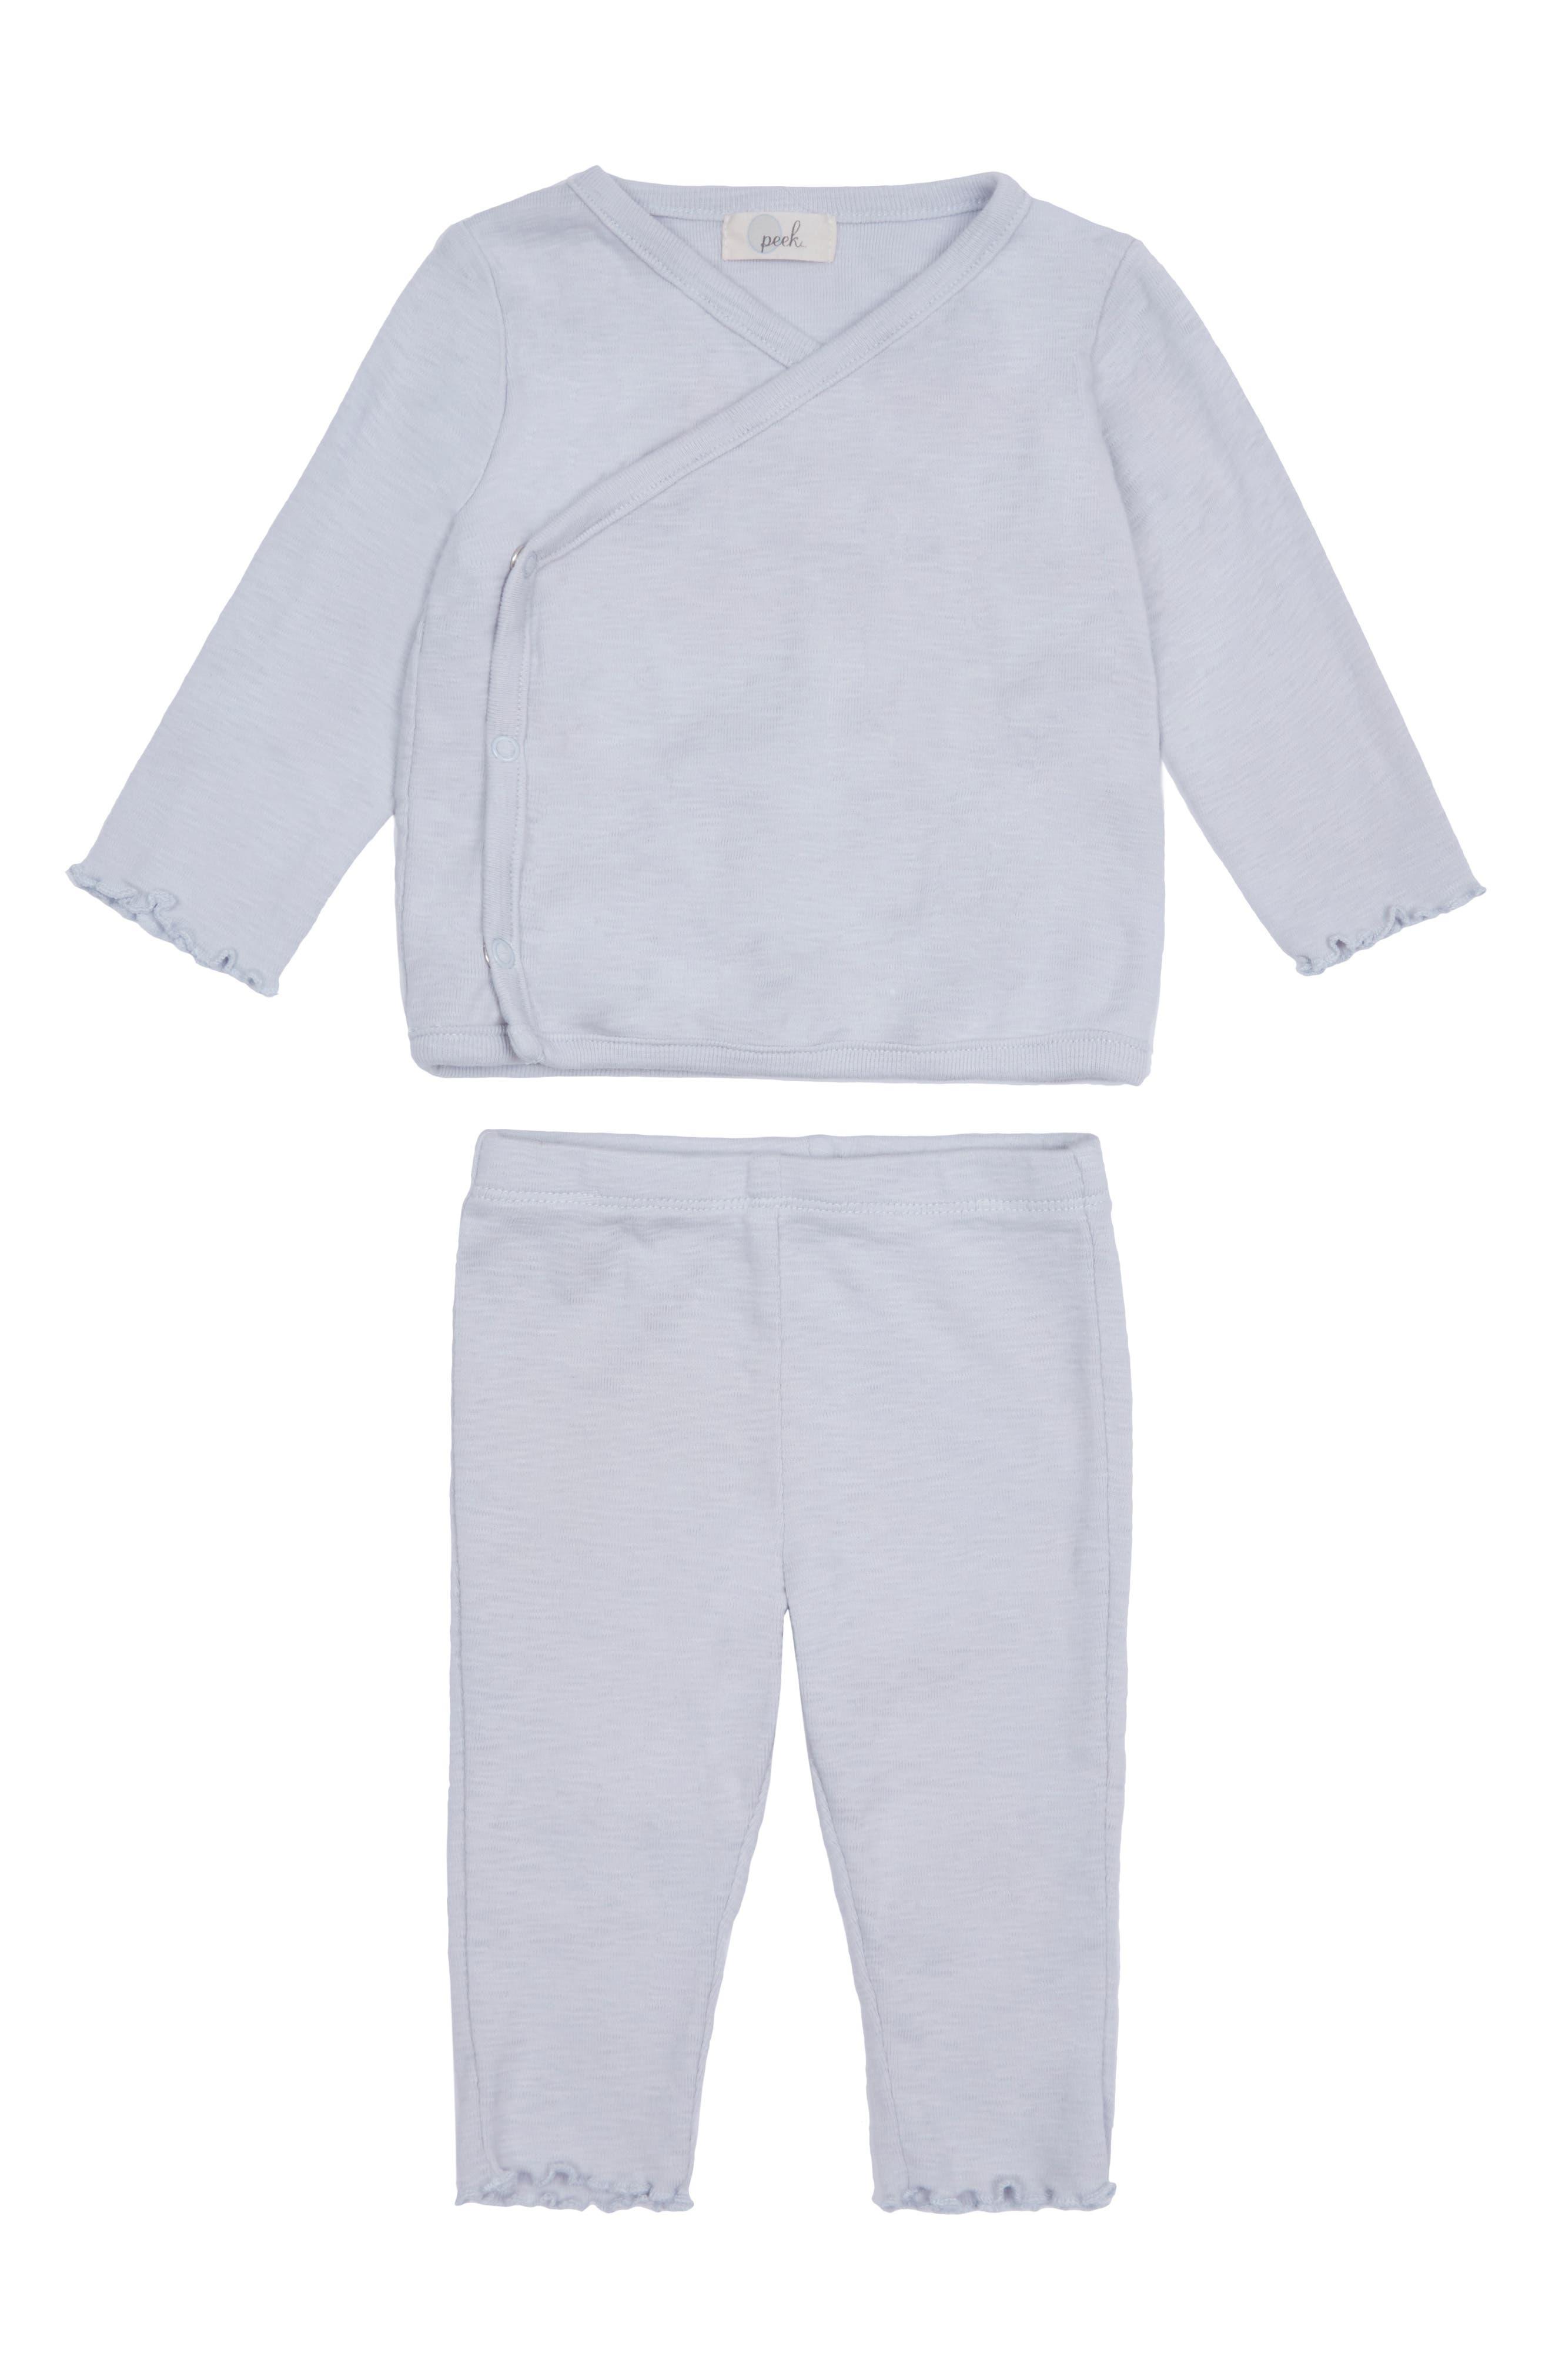 Image of PEEK ESSENTIALS Bailey Wrap Cardigan & Pants Set